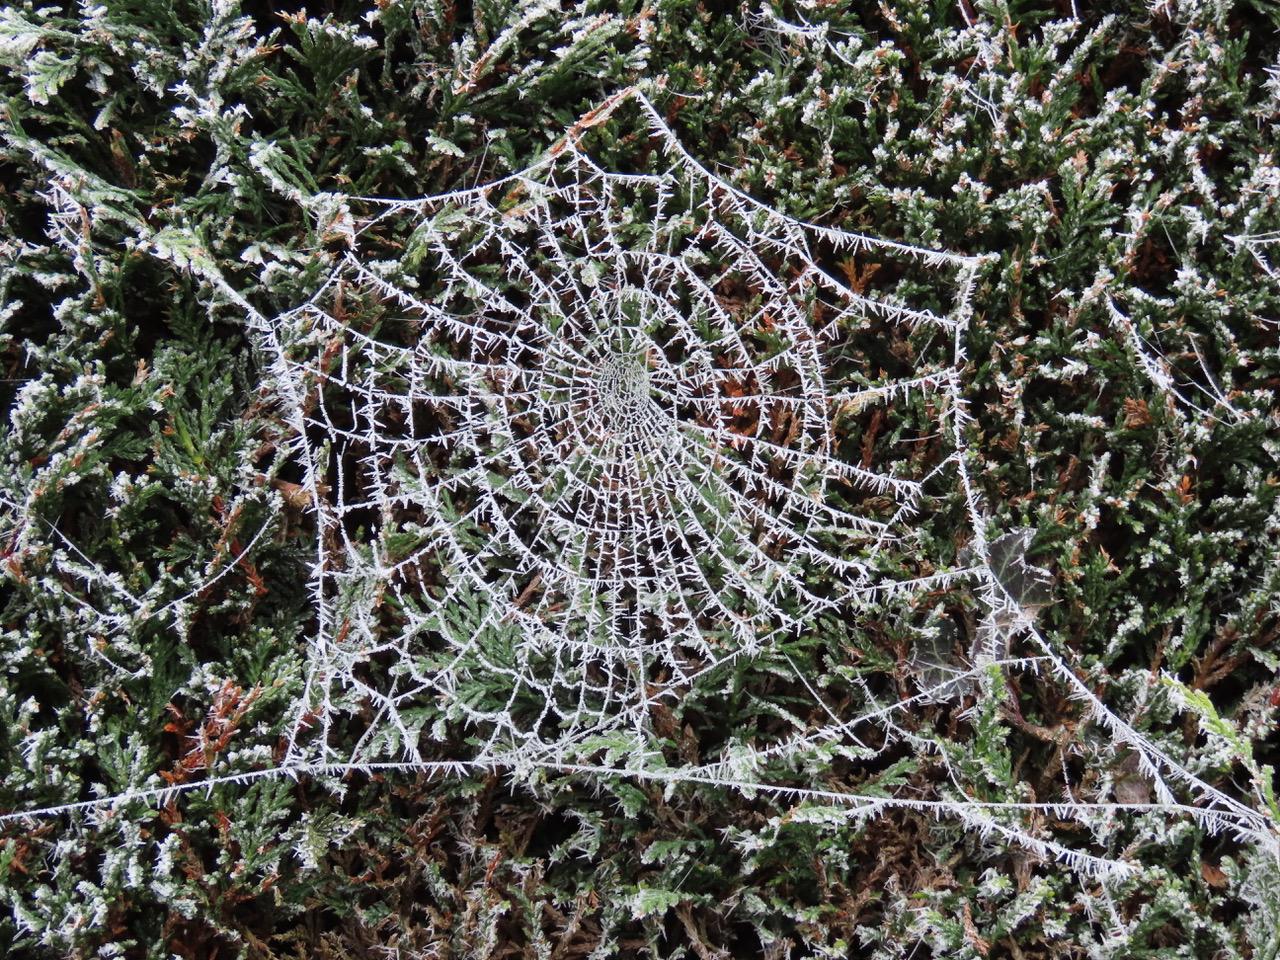 Spider's web © Rosemary Winnall